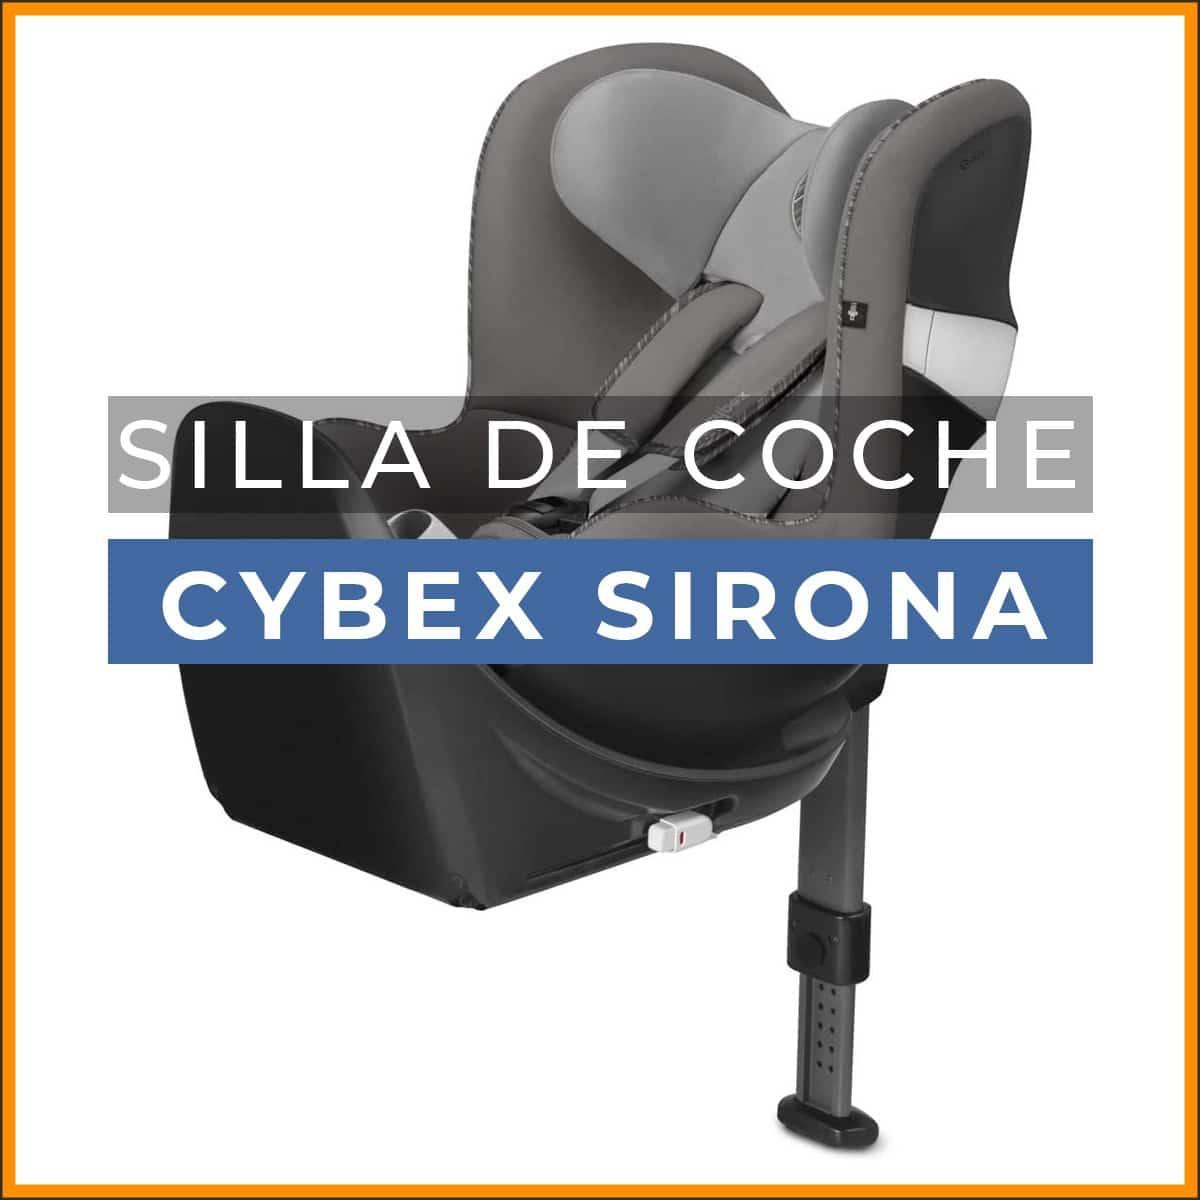 cybex sirona